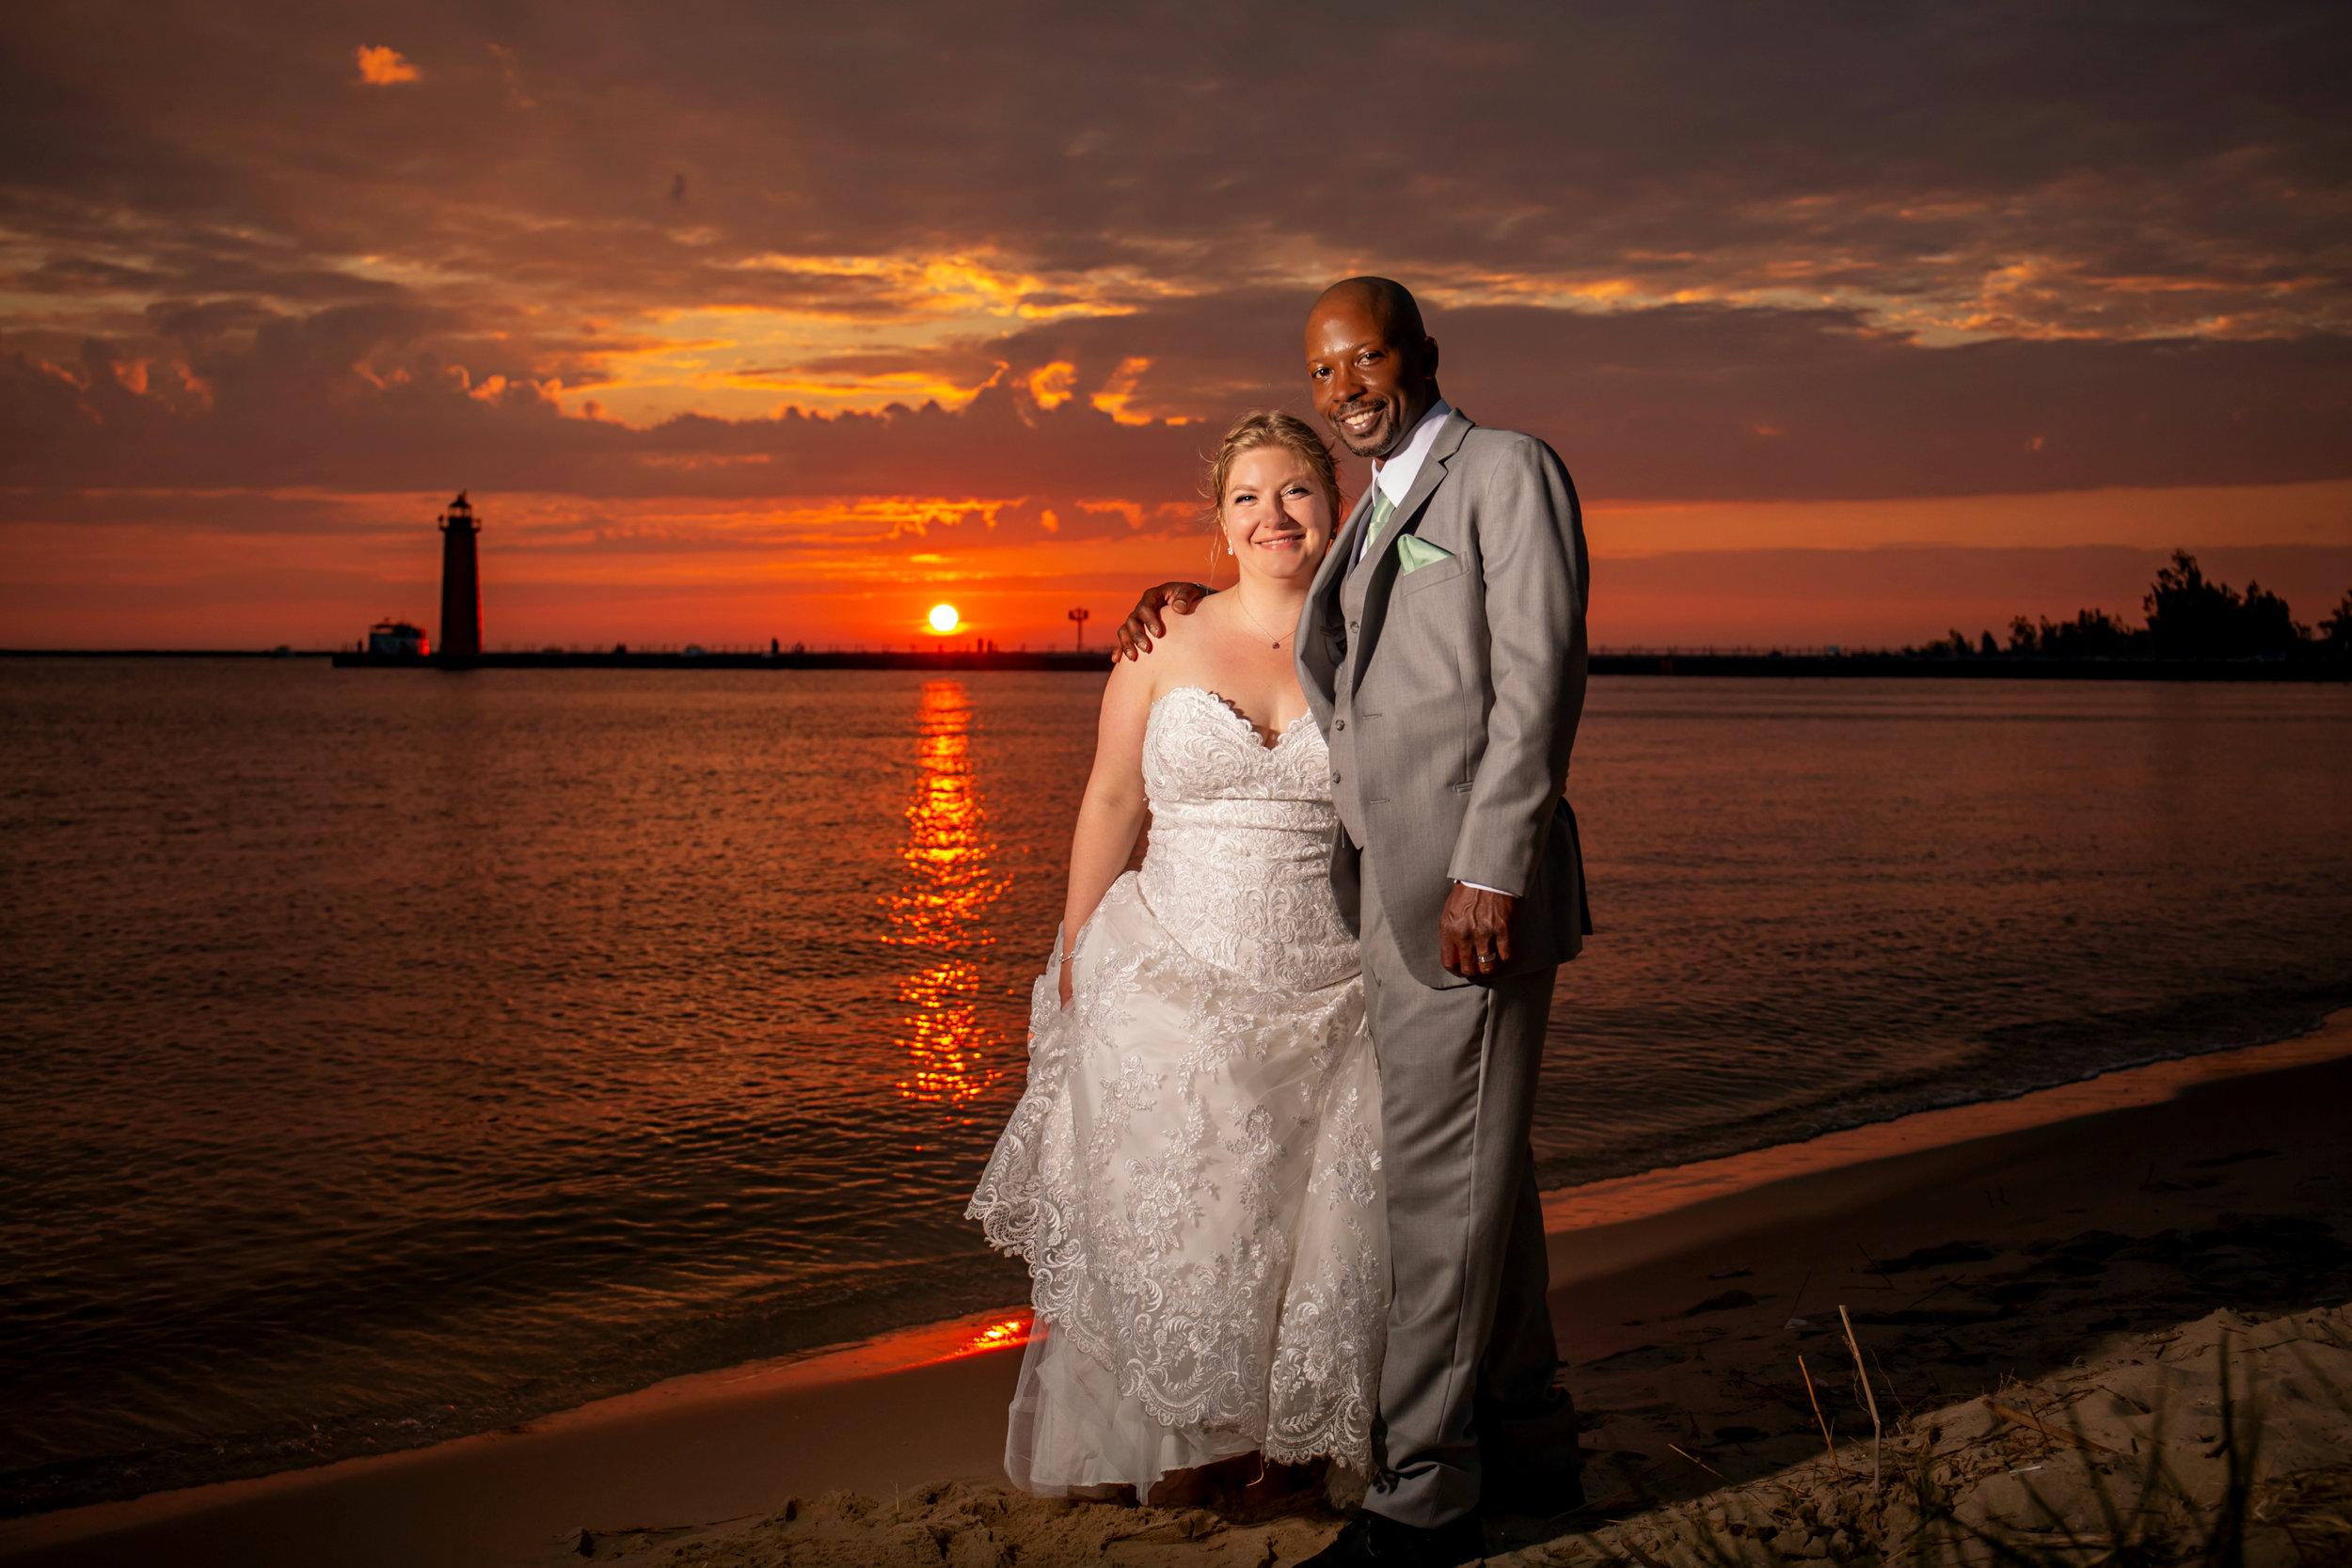 Chambers Wedding 7.6.2019 Muskegon, Michigan.